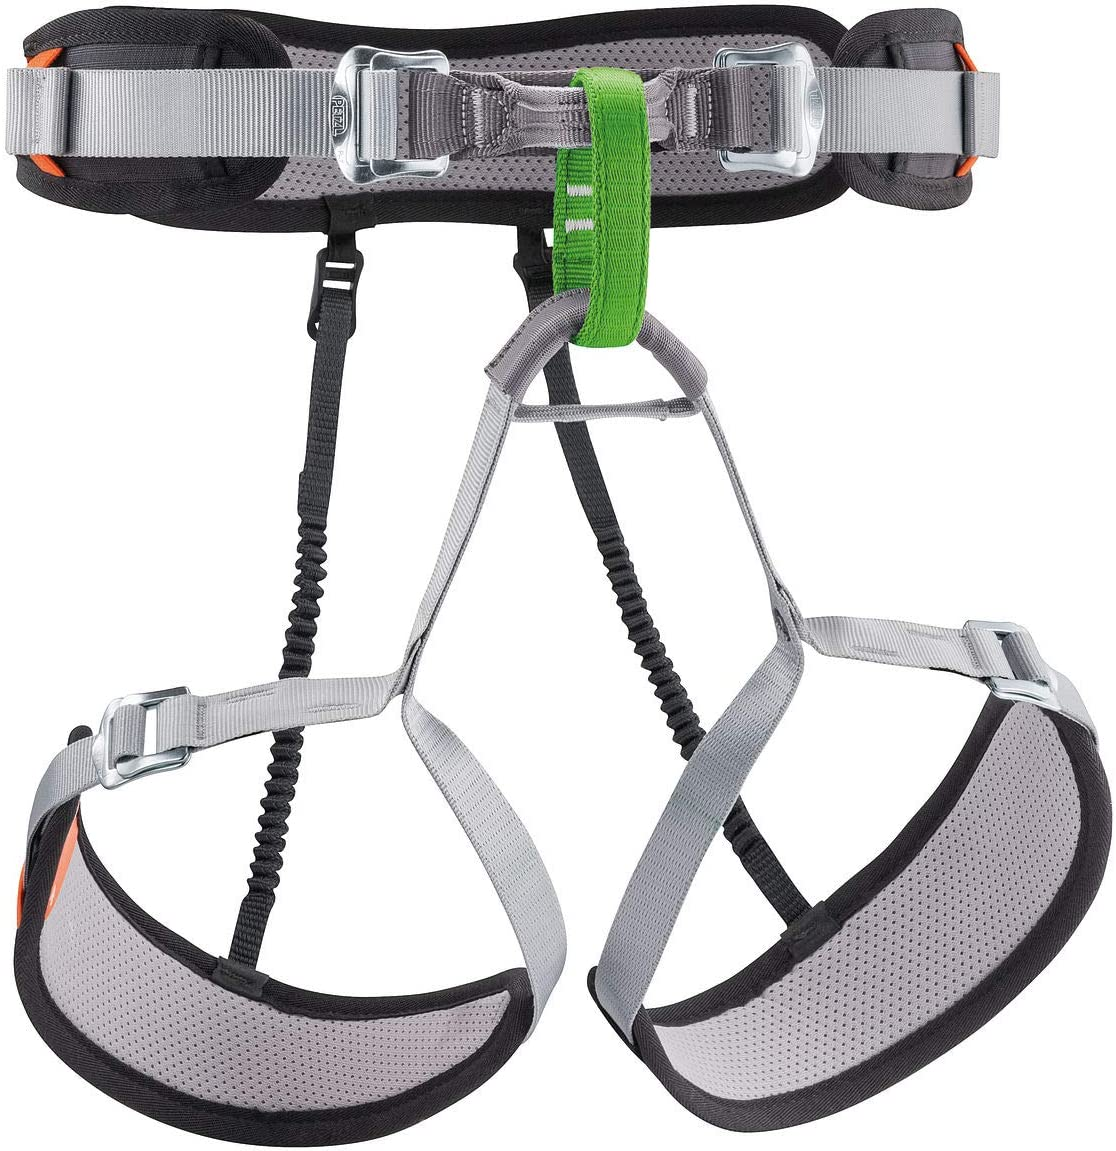 PETZL ASPIR LT Harness - WO Gear Loops